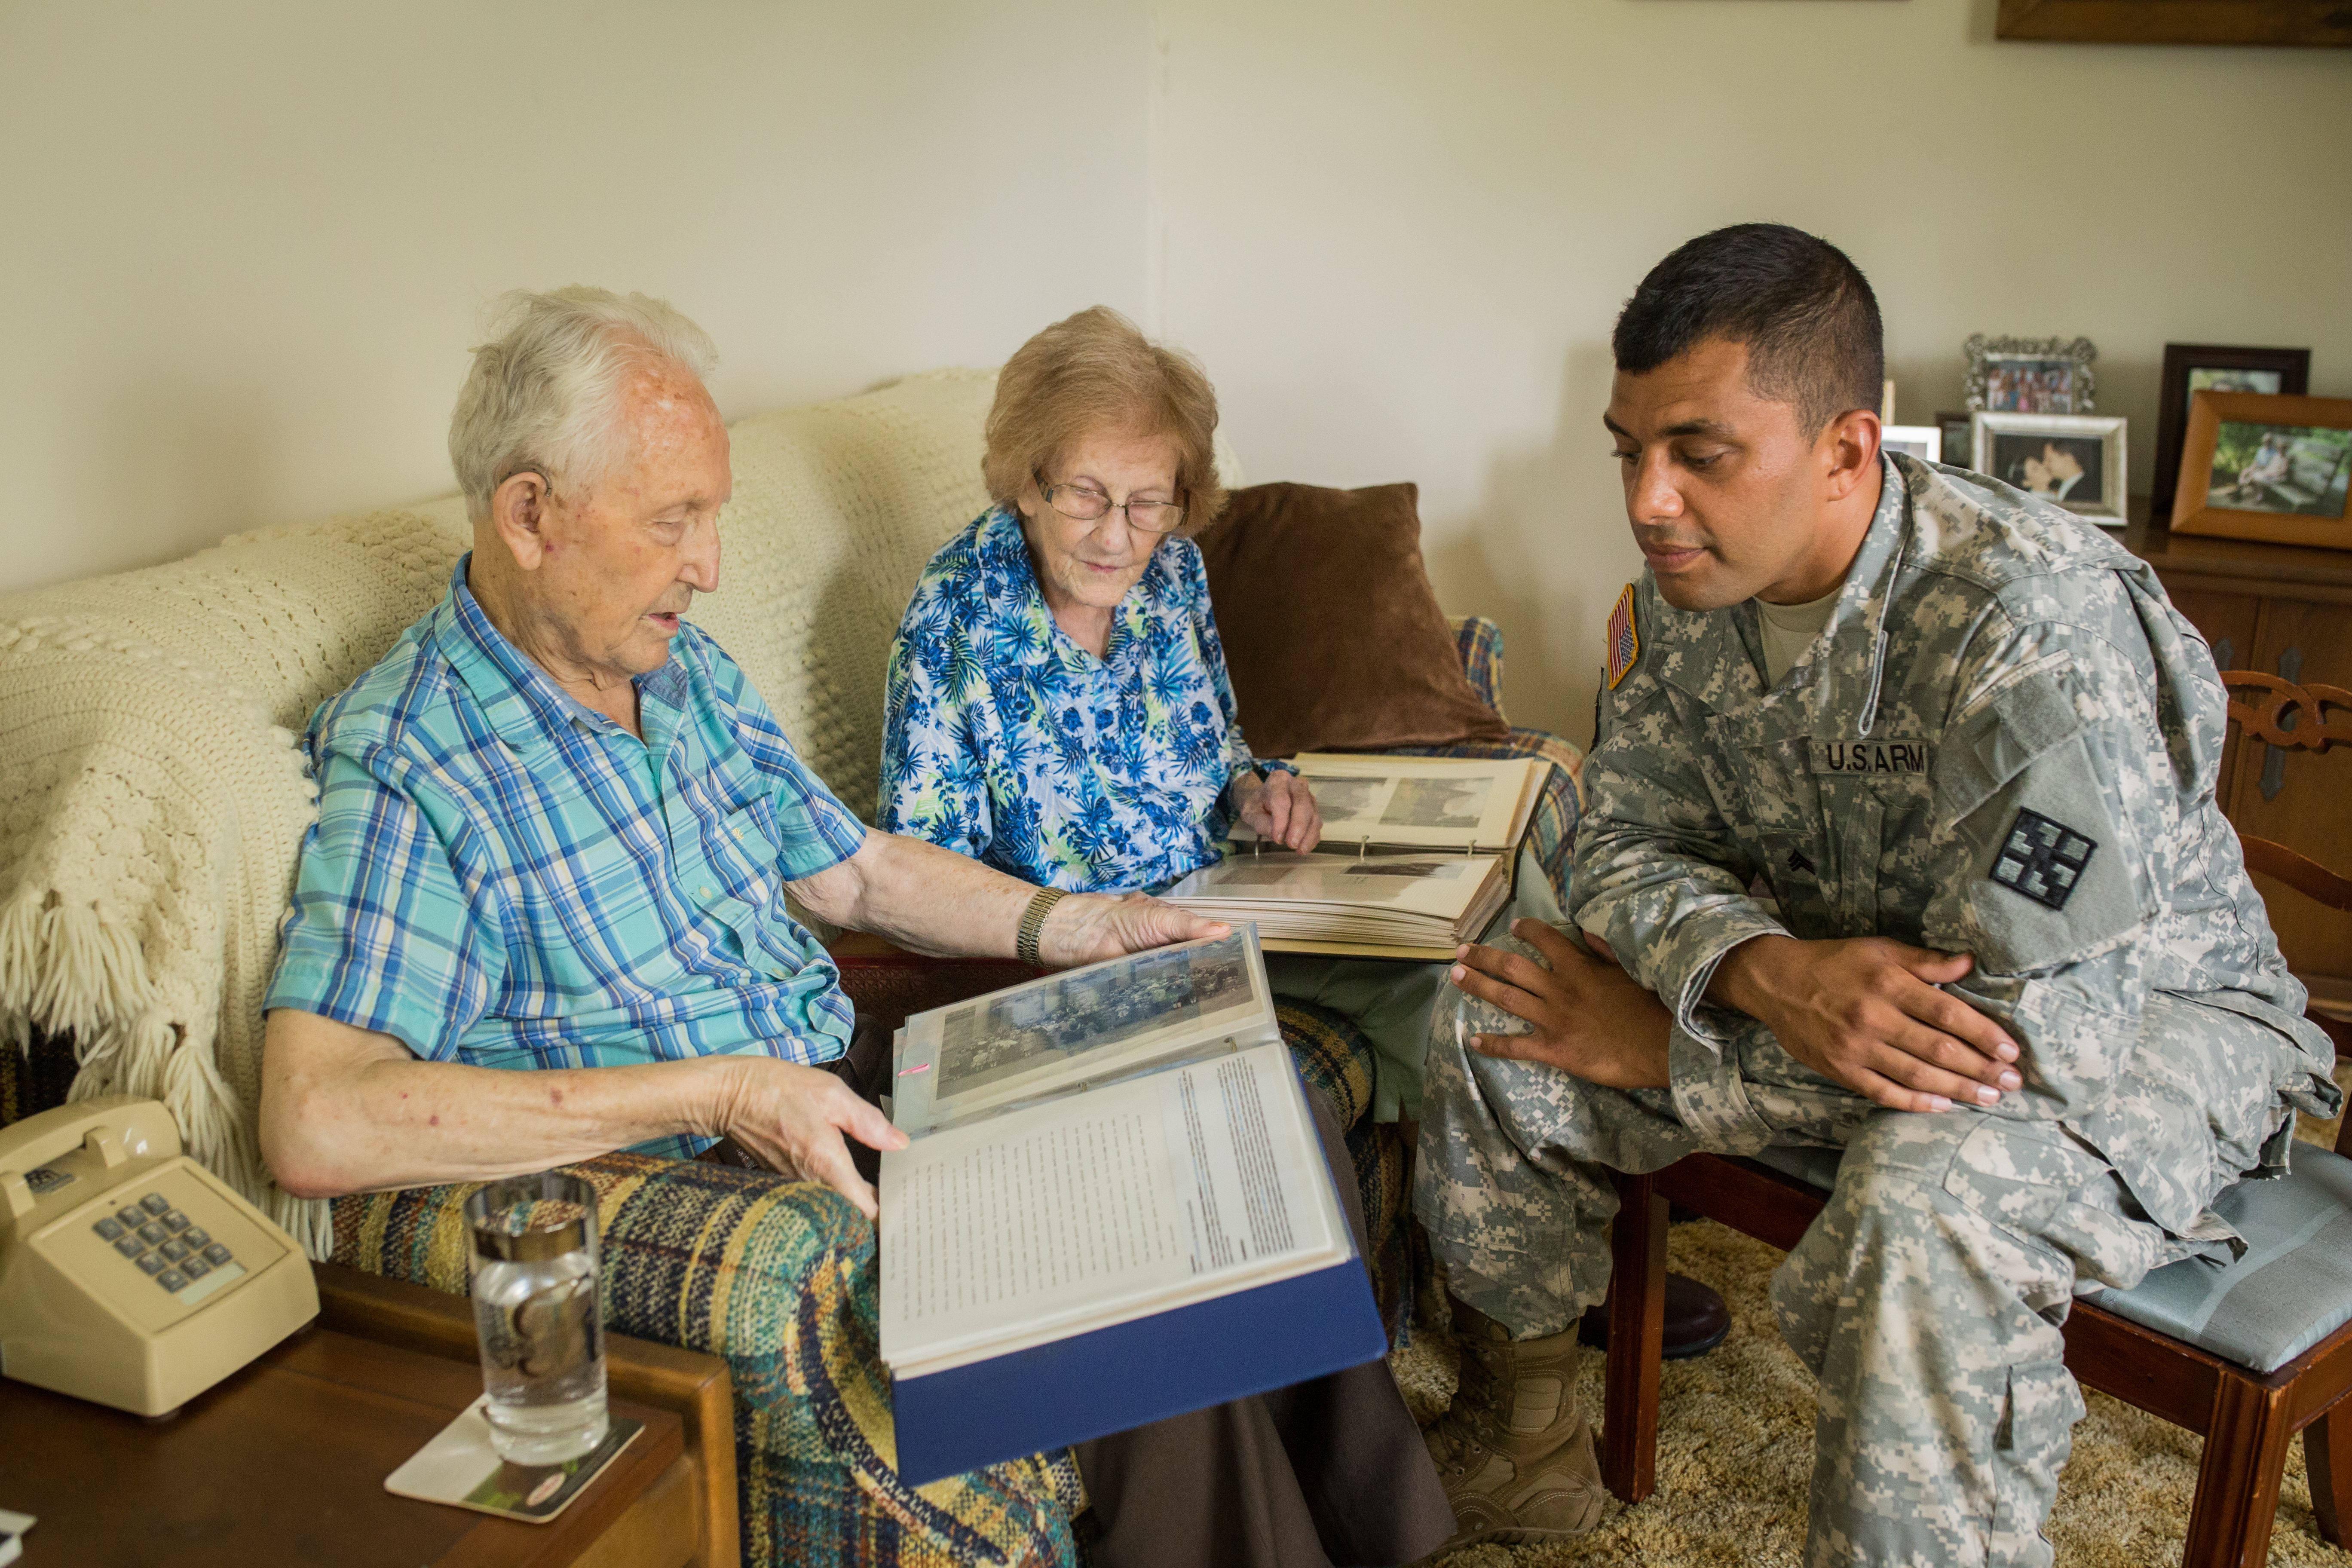 Hospice volunteer providing companionship